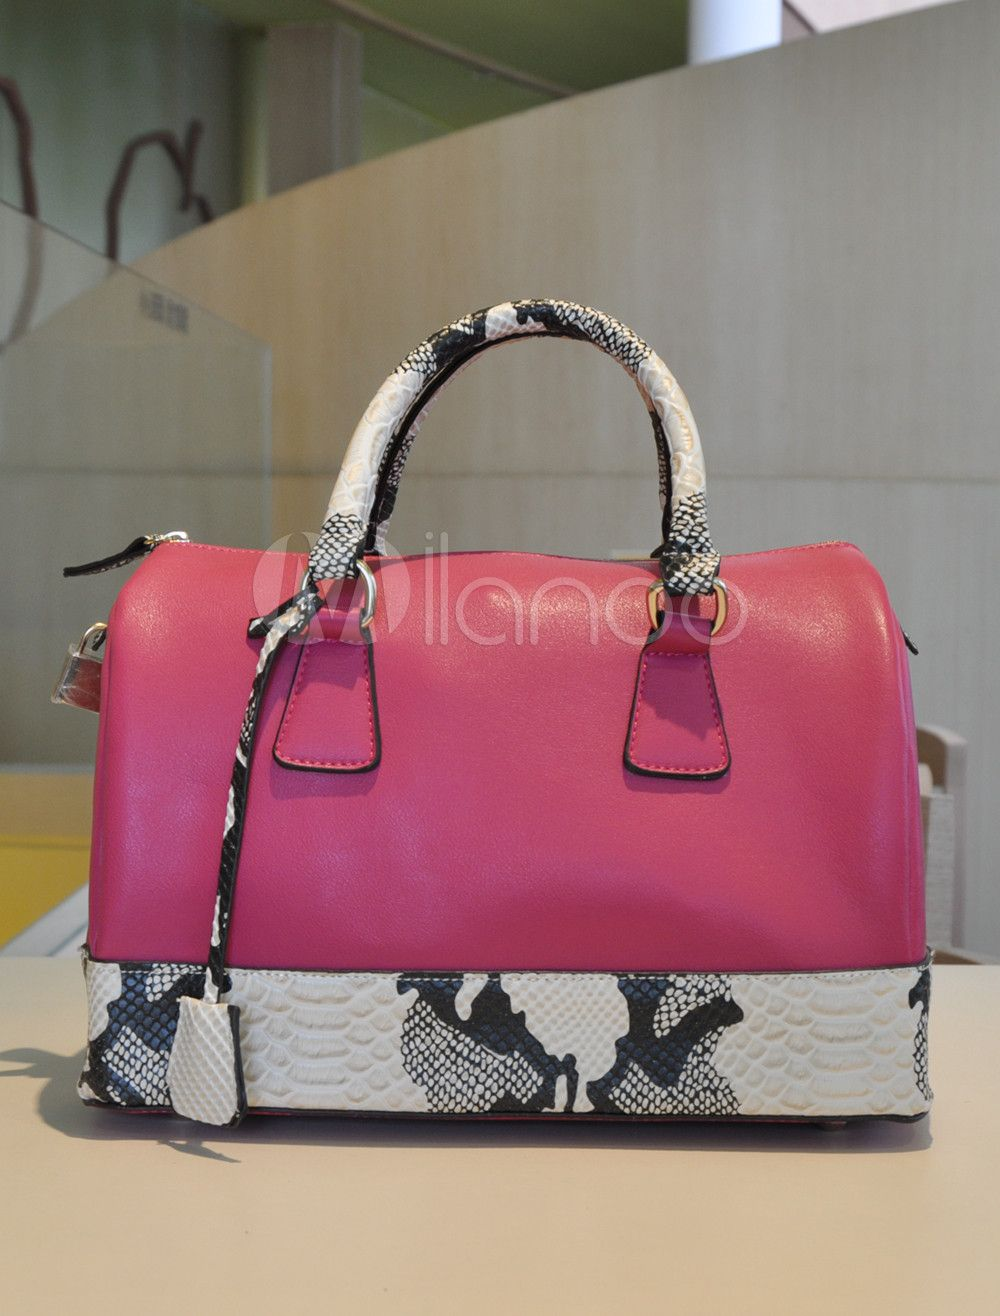 Animal Print Handbags Australia Handbag Photos Eleventyone